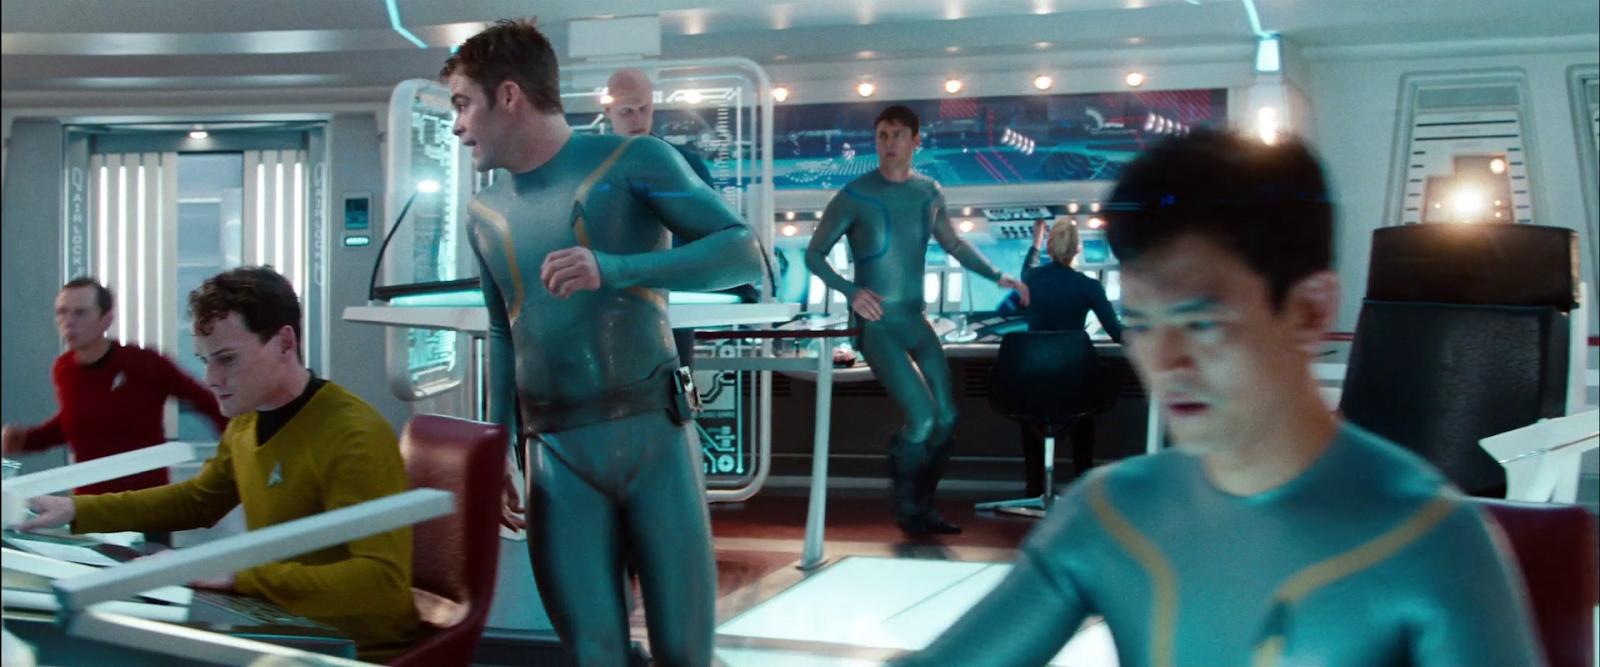 Scifi Fantasy Costumes Gallery Star Trek Into Darkness 2013